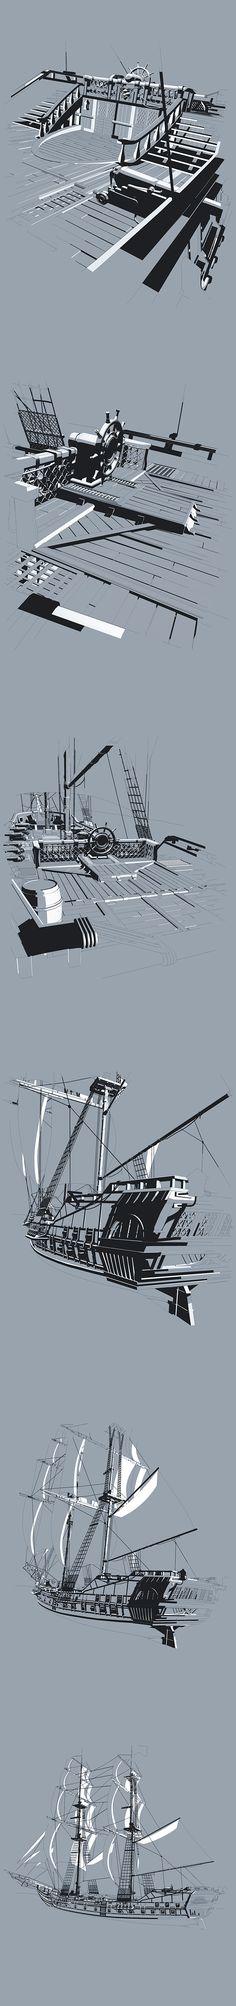 Jackdaw - Pirate Ship on Behance